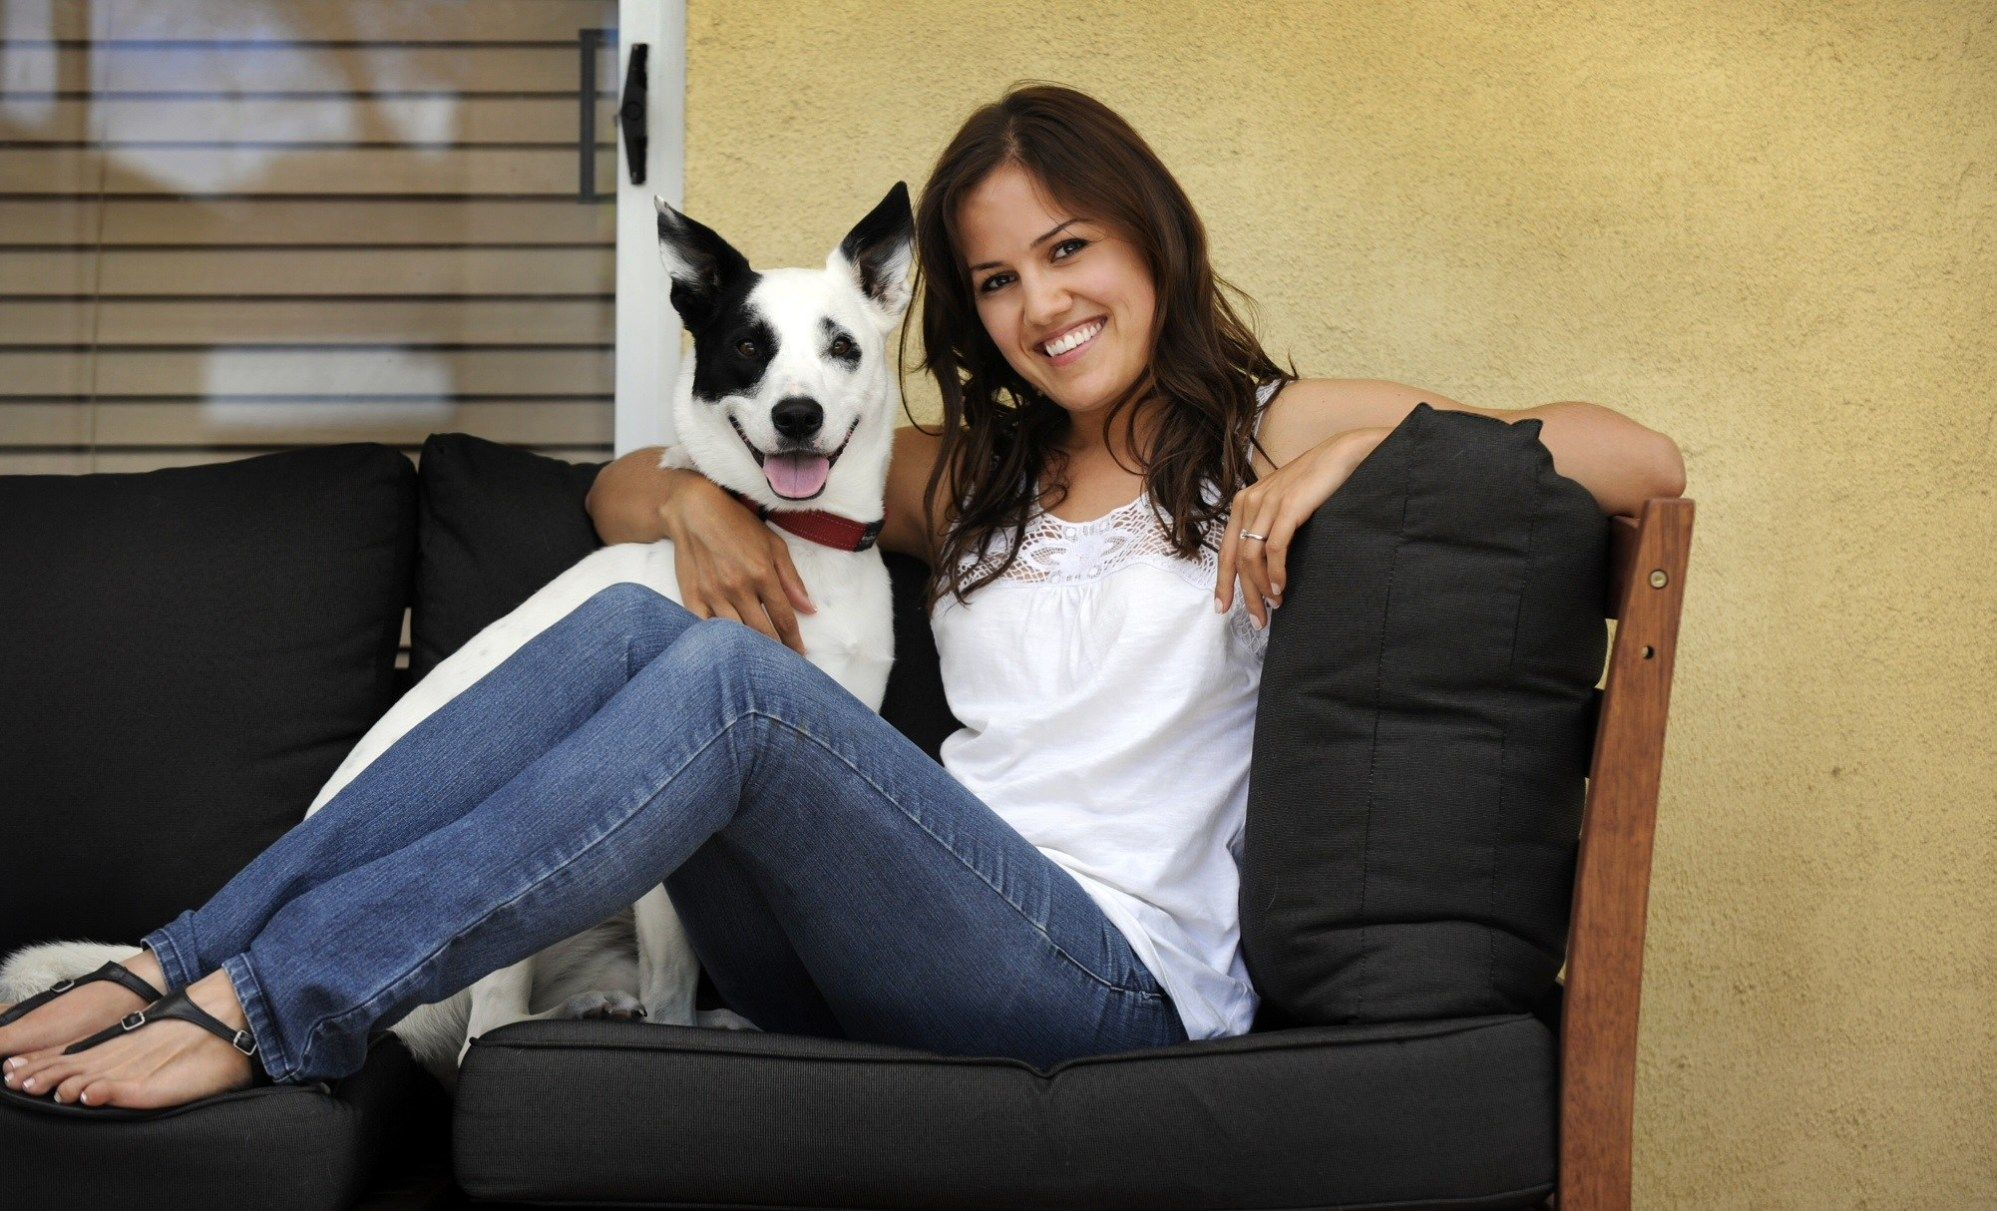 Laurel Craigslist Pets Frontier pets is one of cheyenne's best pet shops. letitsnowglobe co uk